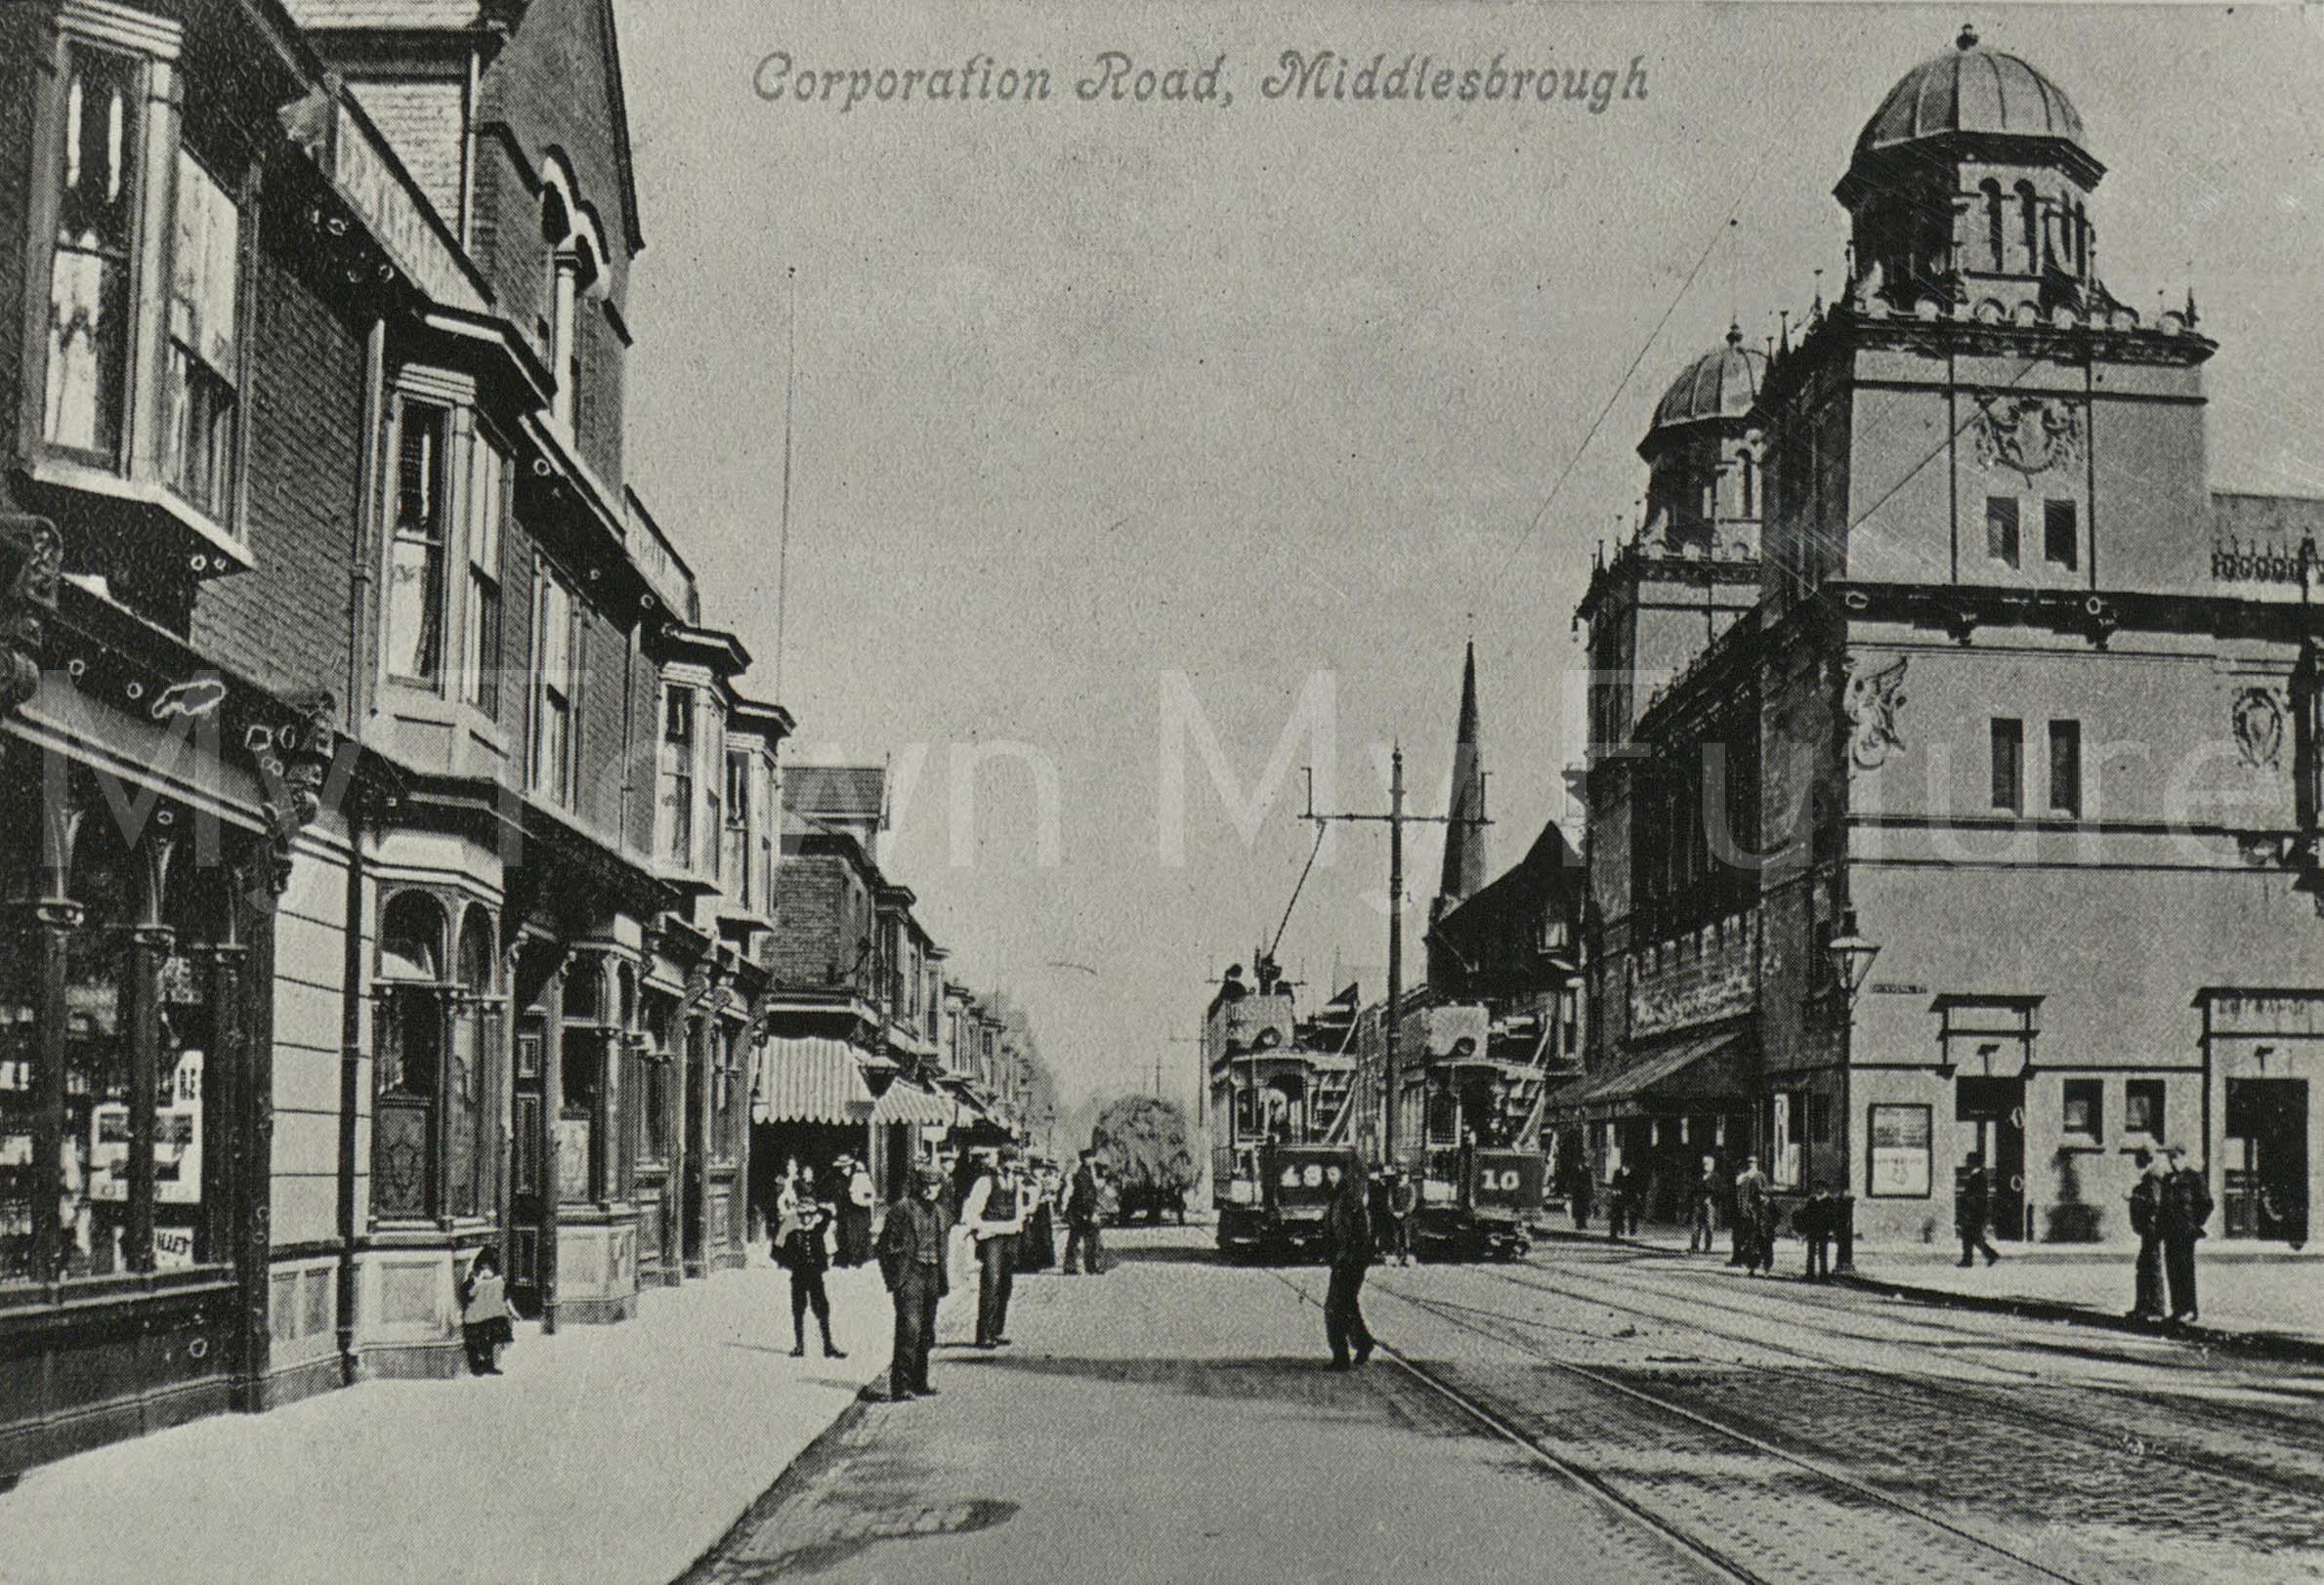 Corporation Road,Empire Music Hall